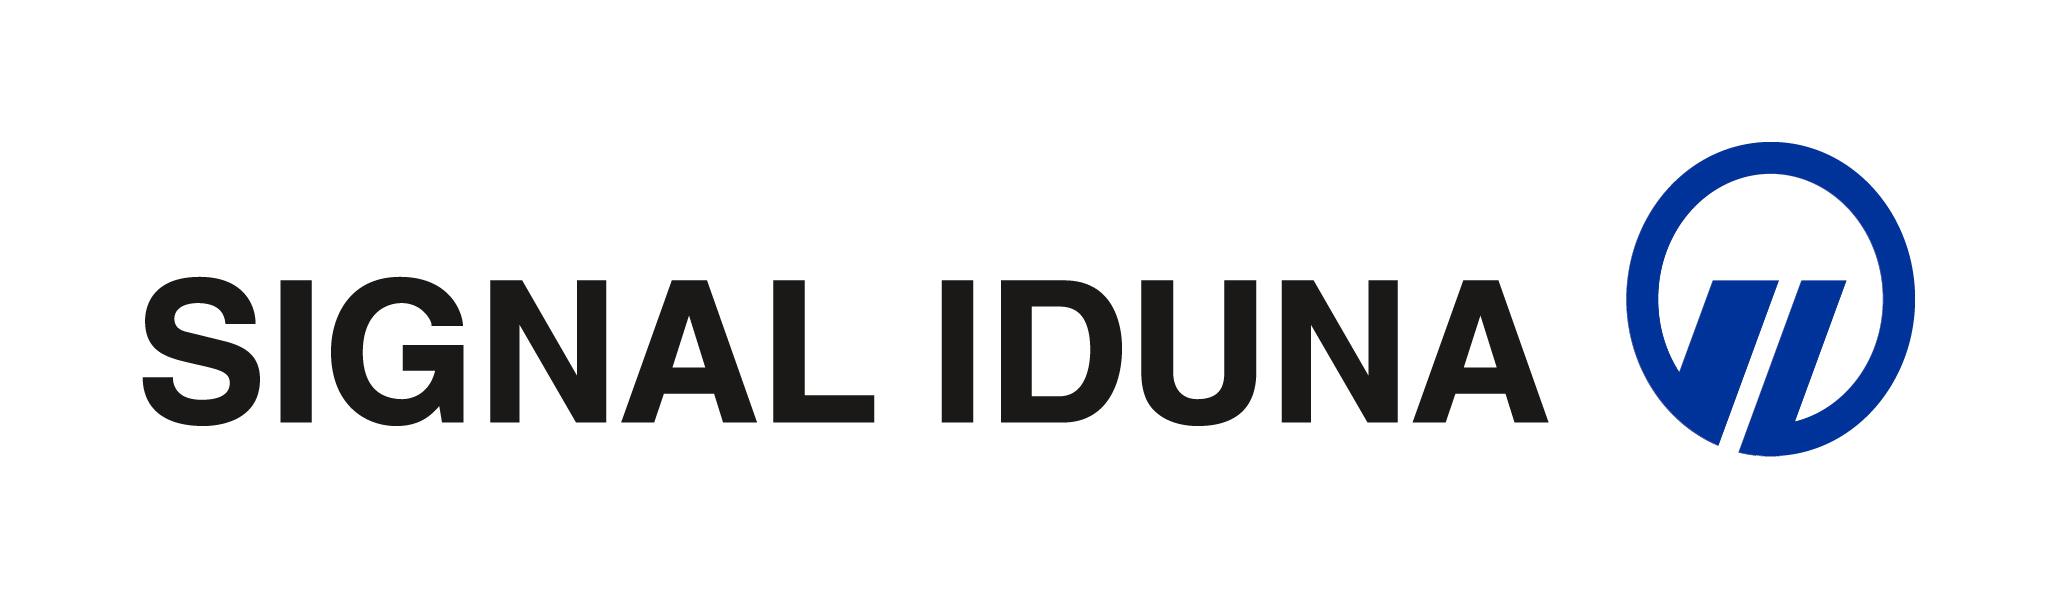 Signal Iduna Michael Scholz, Neu-Ulm